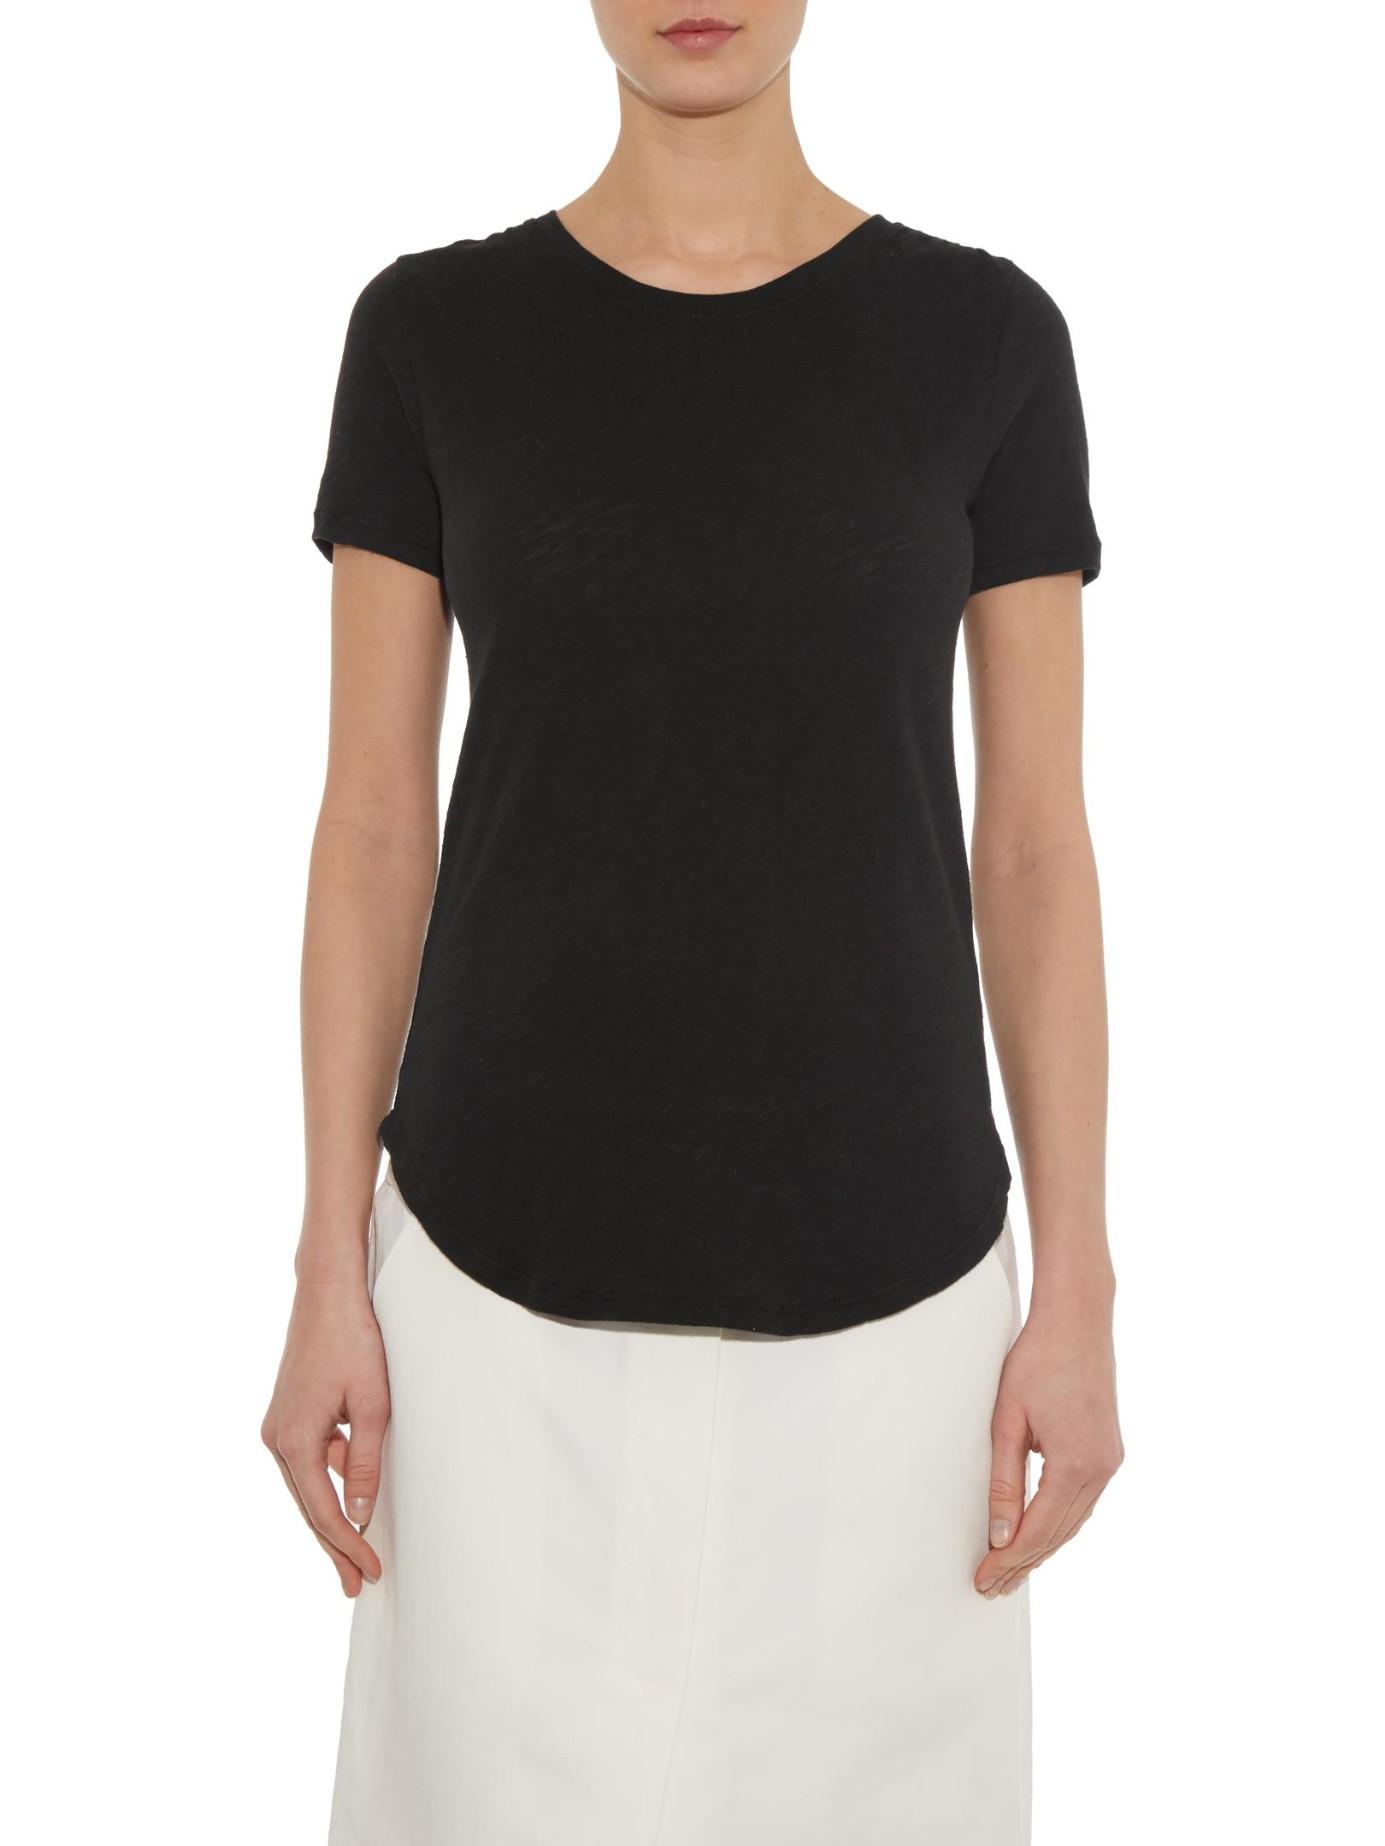 Atm slub cotton jersey t shirt in black lyst for What is a slub shirt